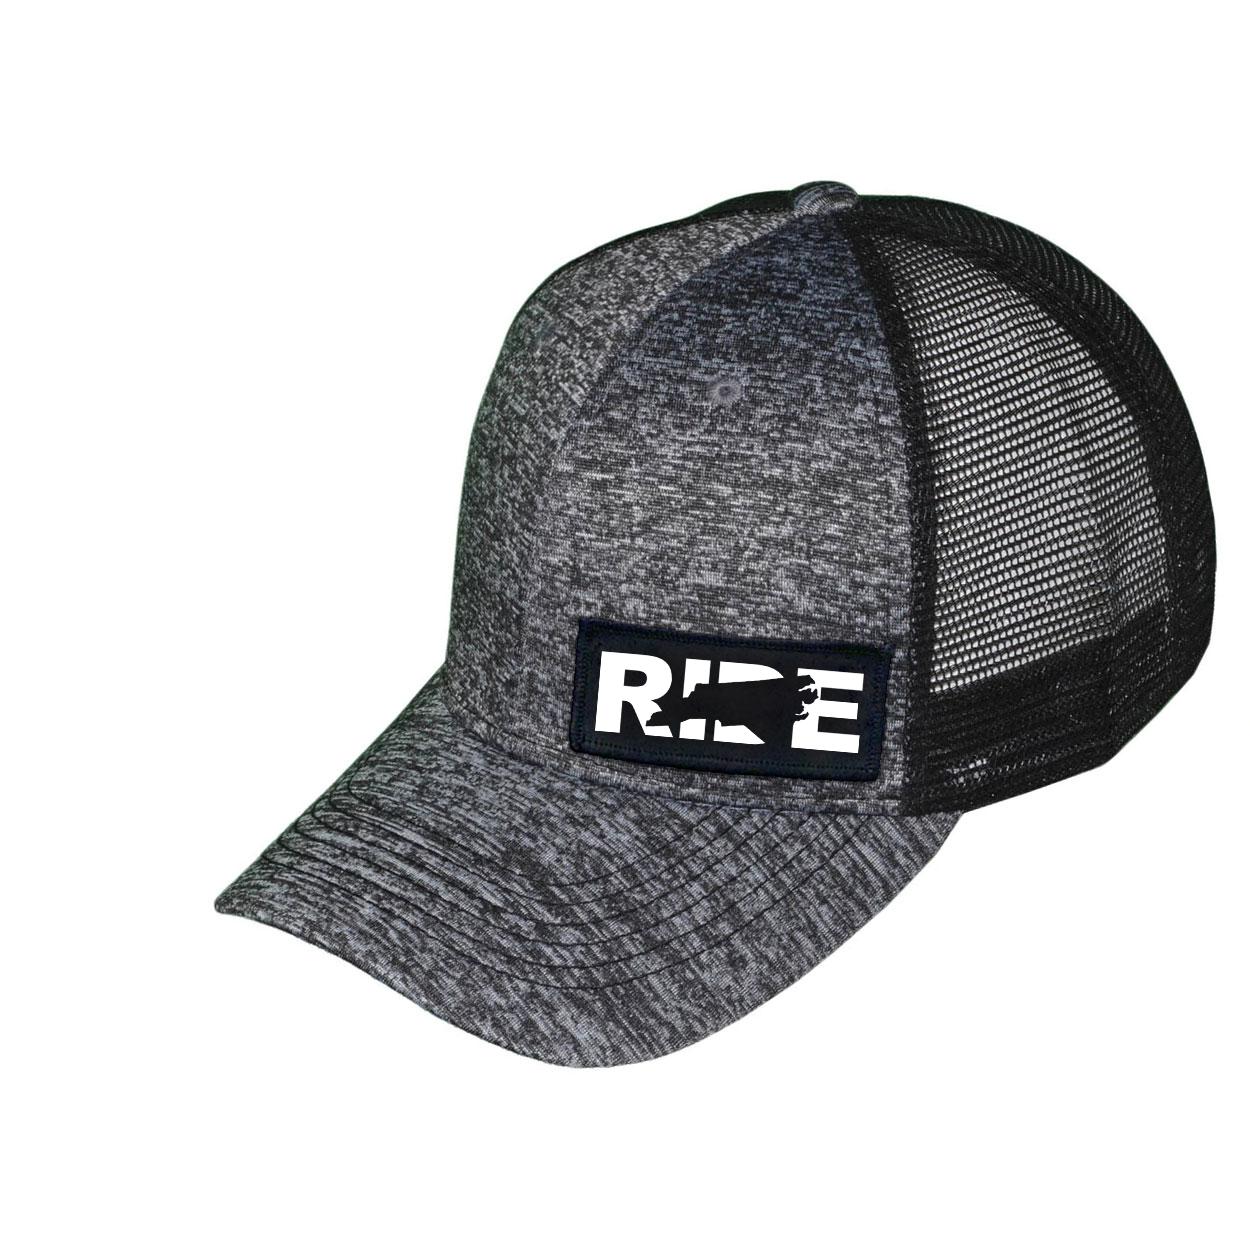 Ride North Carolina Night Out Woven Patch Melange Snapback Trucker Hat Gray/Black (White Logo)